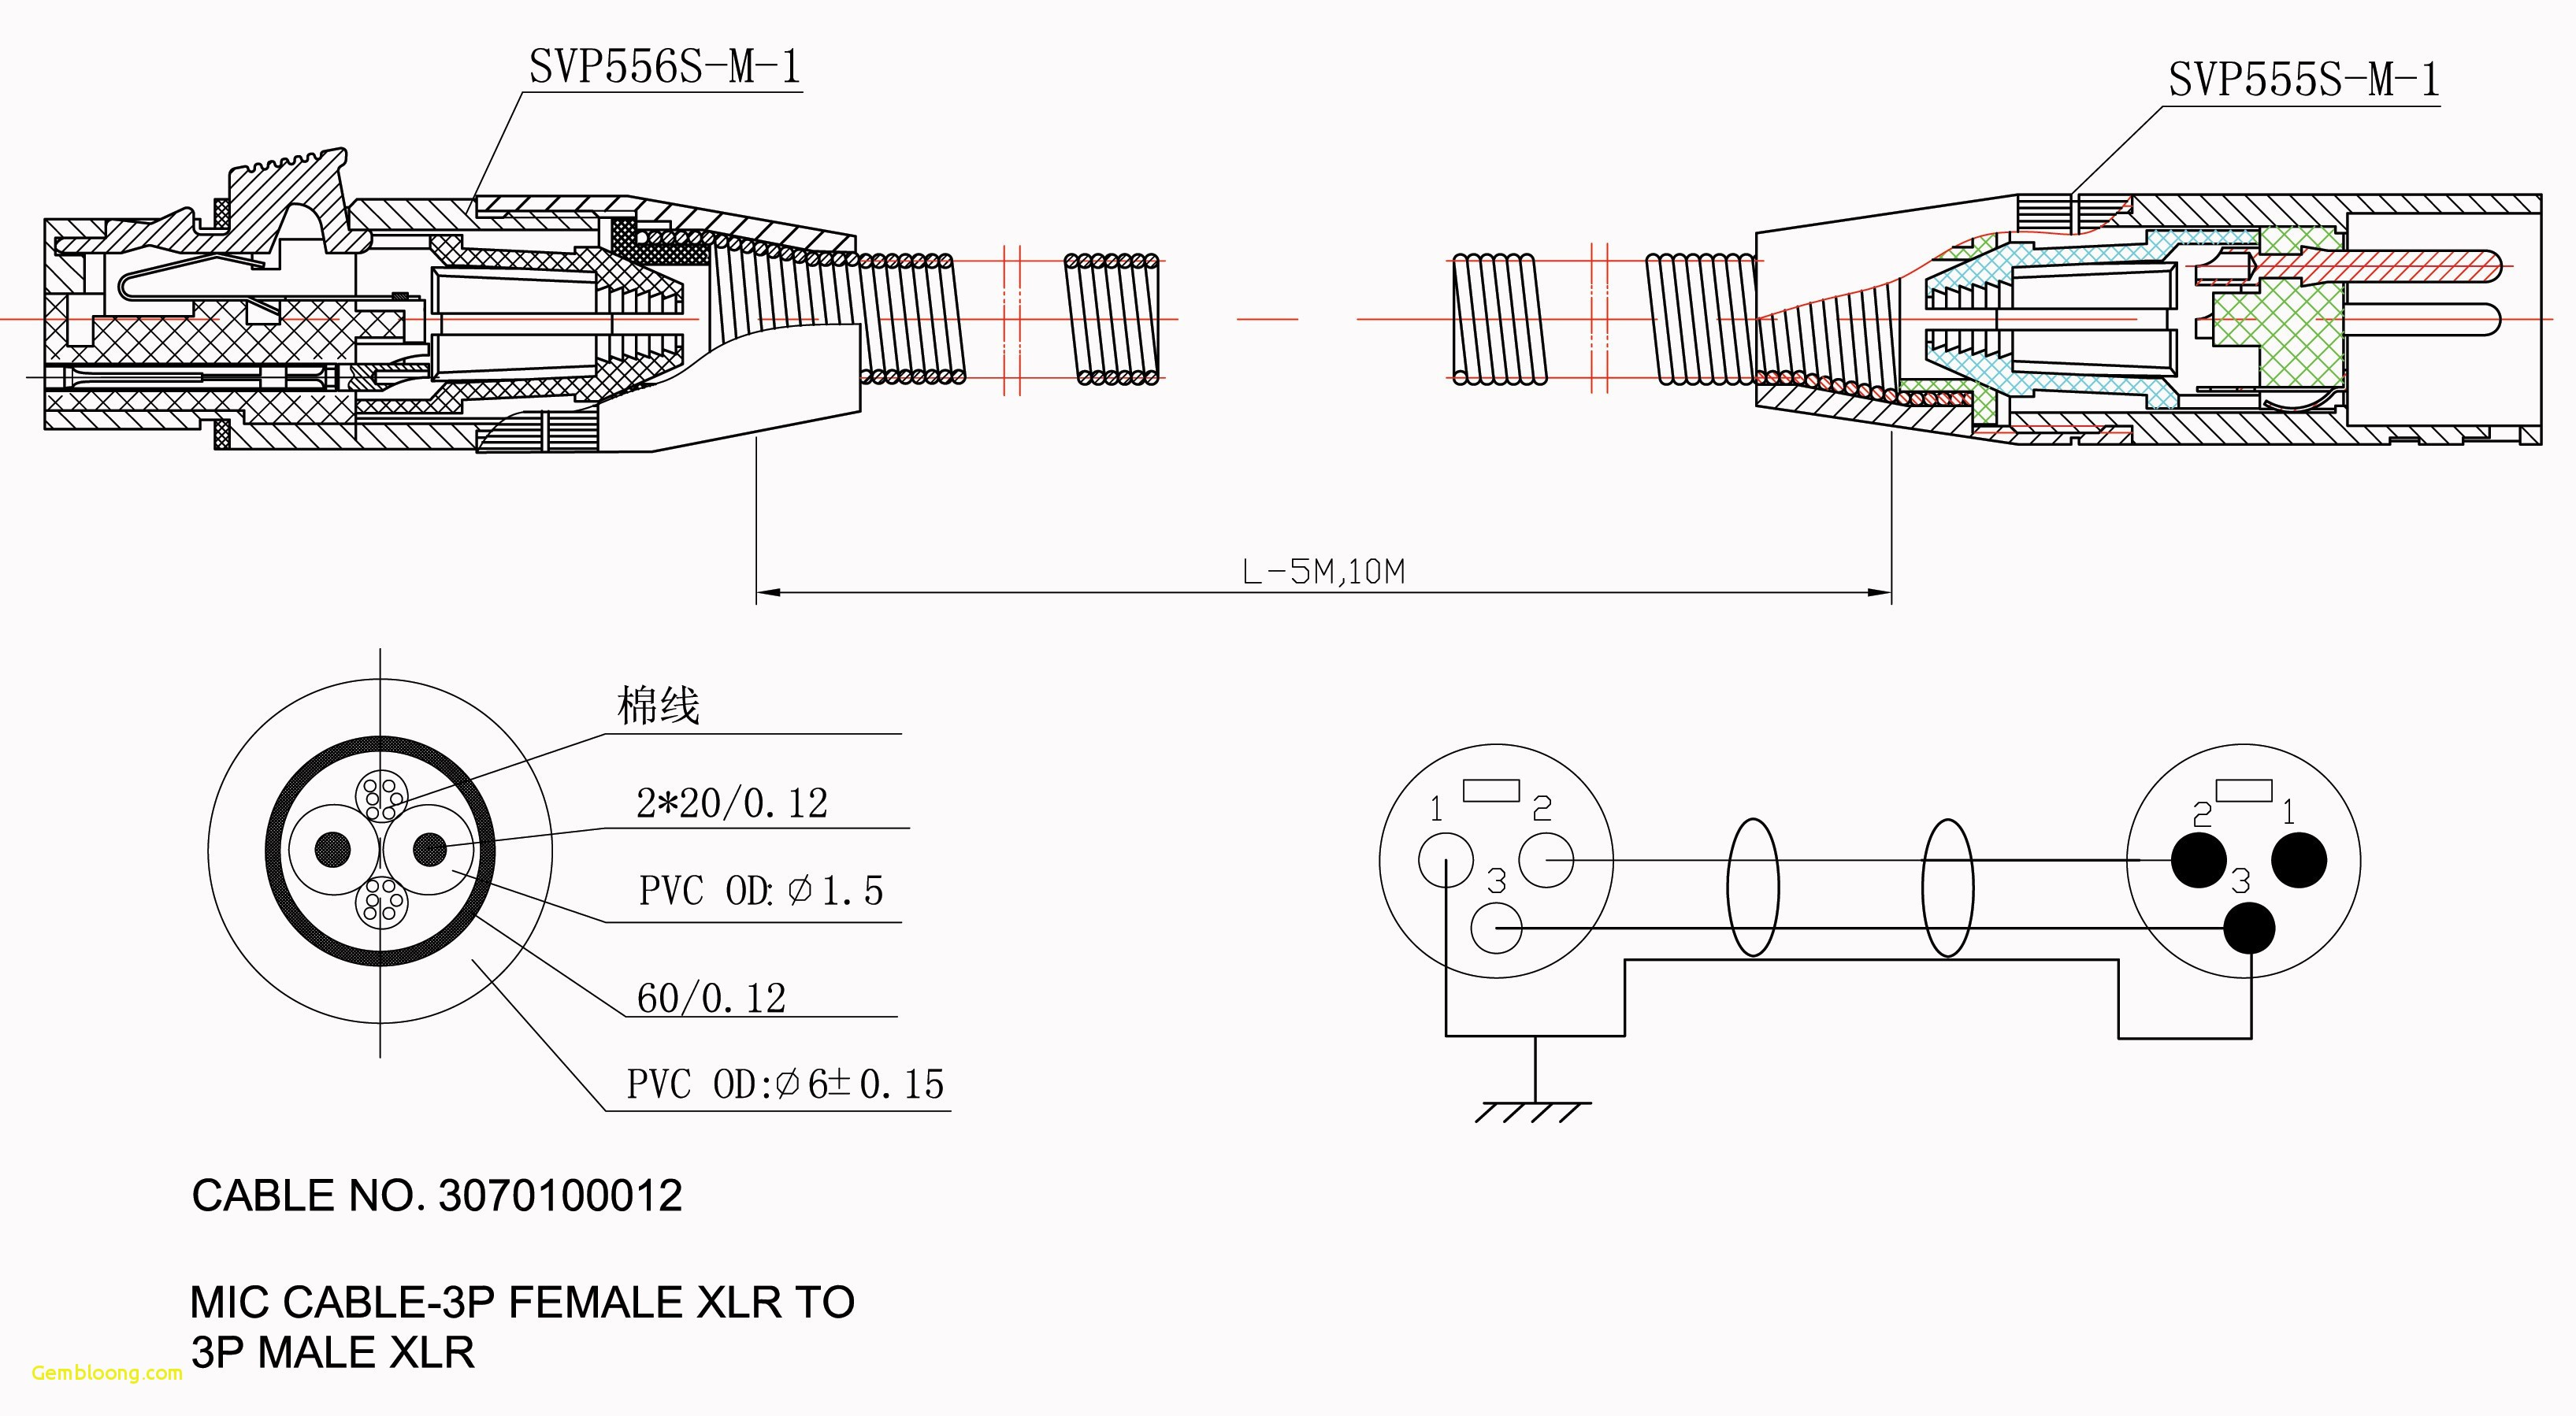 2001 Vw Jetta Engine Diagram 40 2001 Honda Shadow Spirit 750 Wiring Diagram Download – Wiring Diagram Of 2001 Vw Jetta Engine Diagram